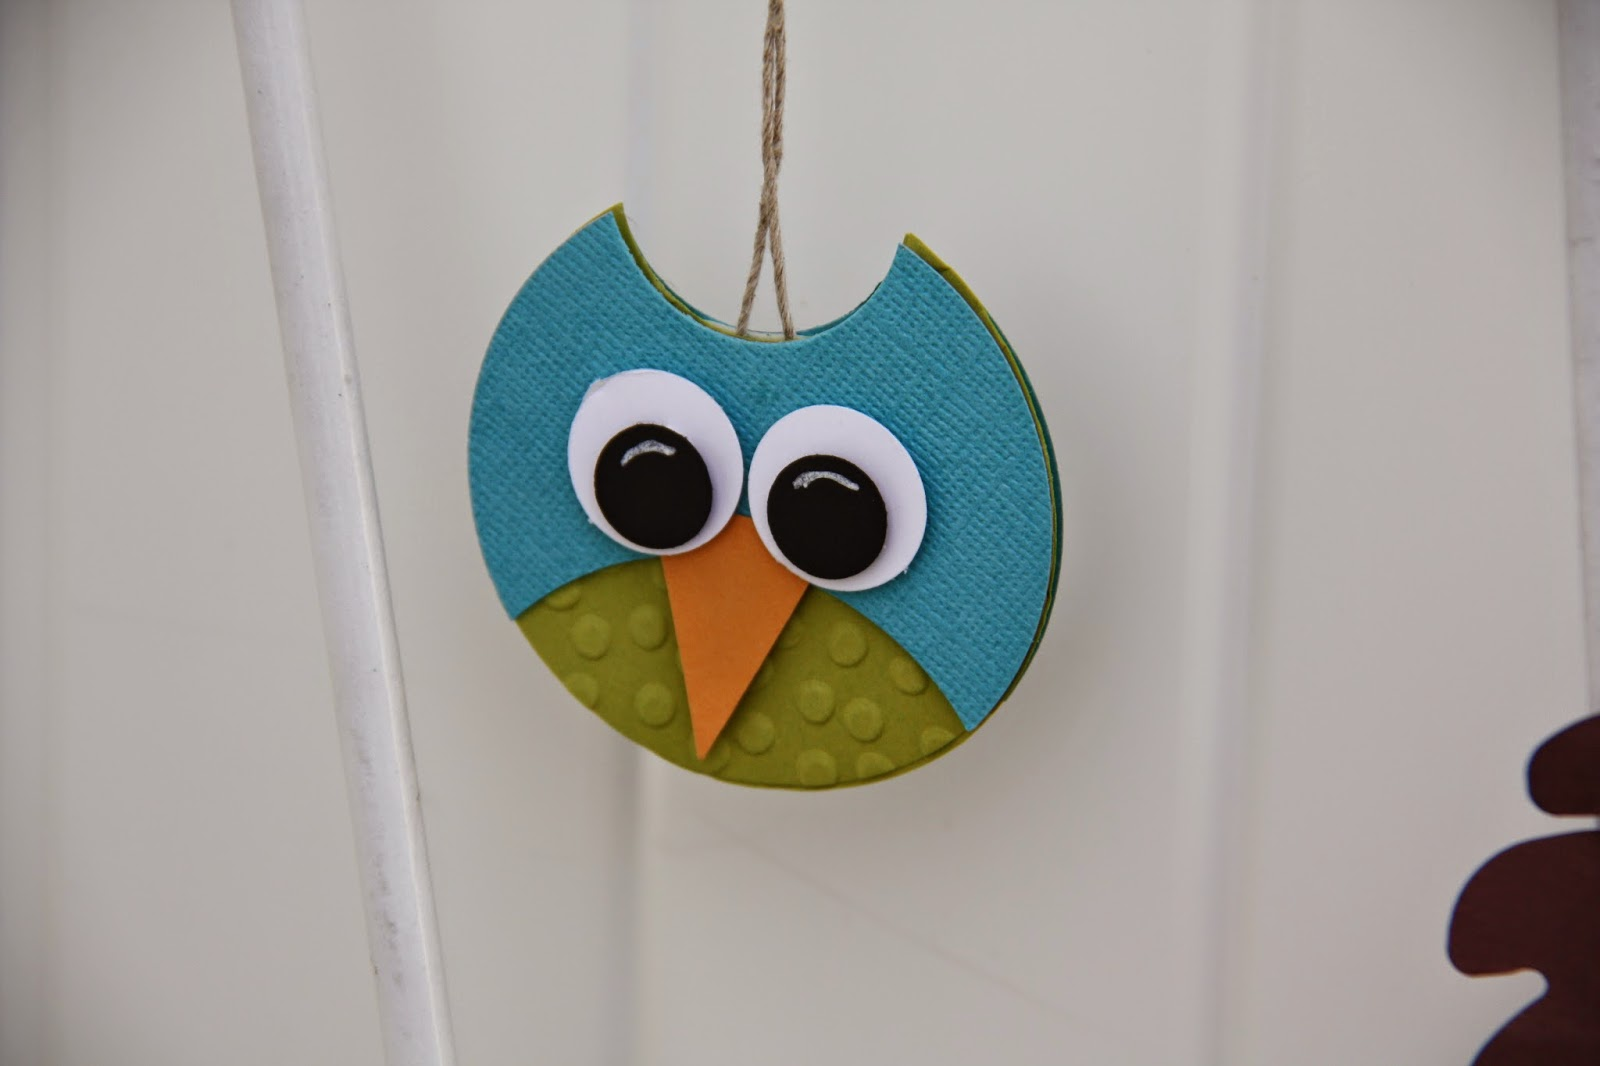 derstempelvogel herbst dekoration mit eulen ii autumn decoration with owls ii. Black Bedroom Furniture Sets. Home Design Ideas